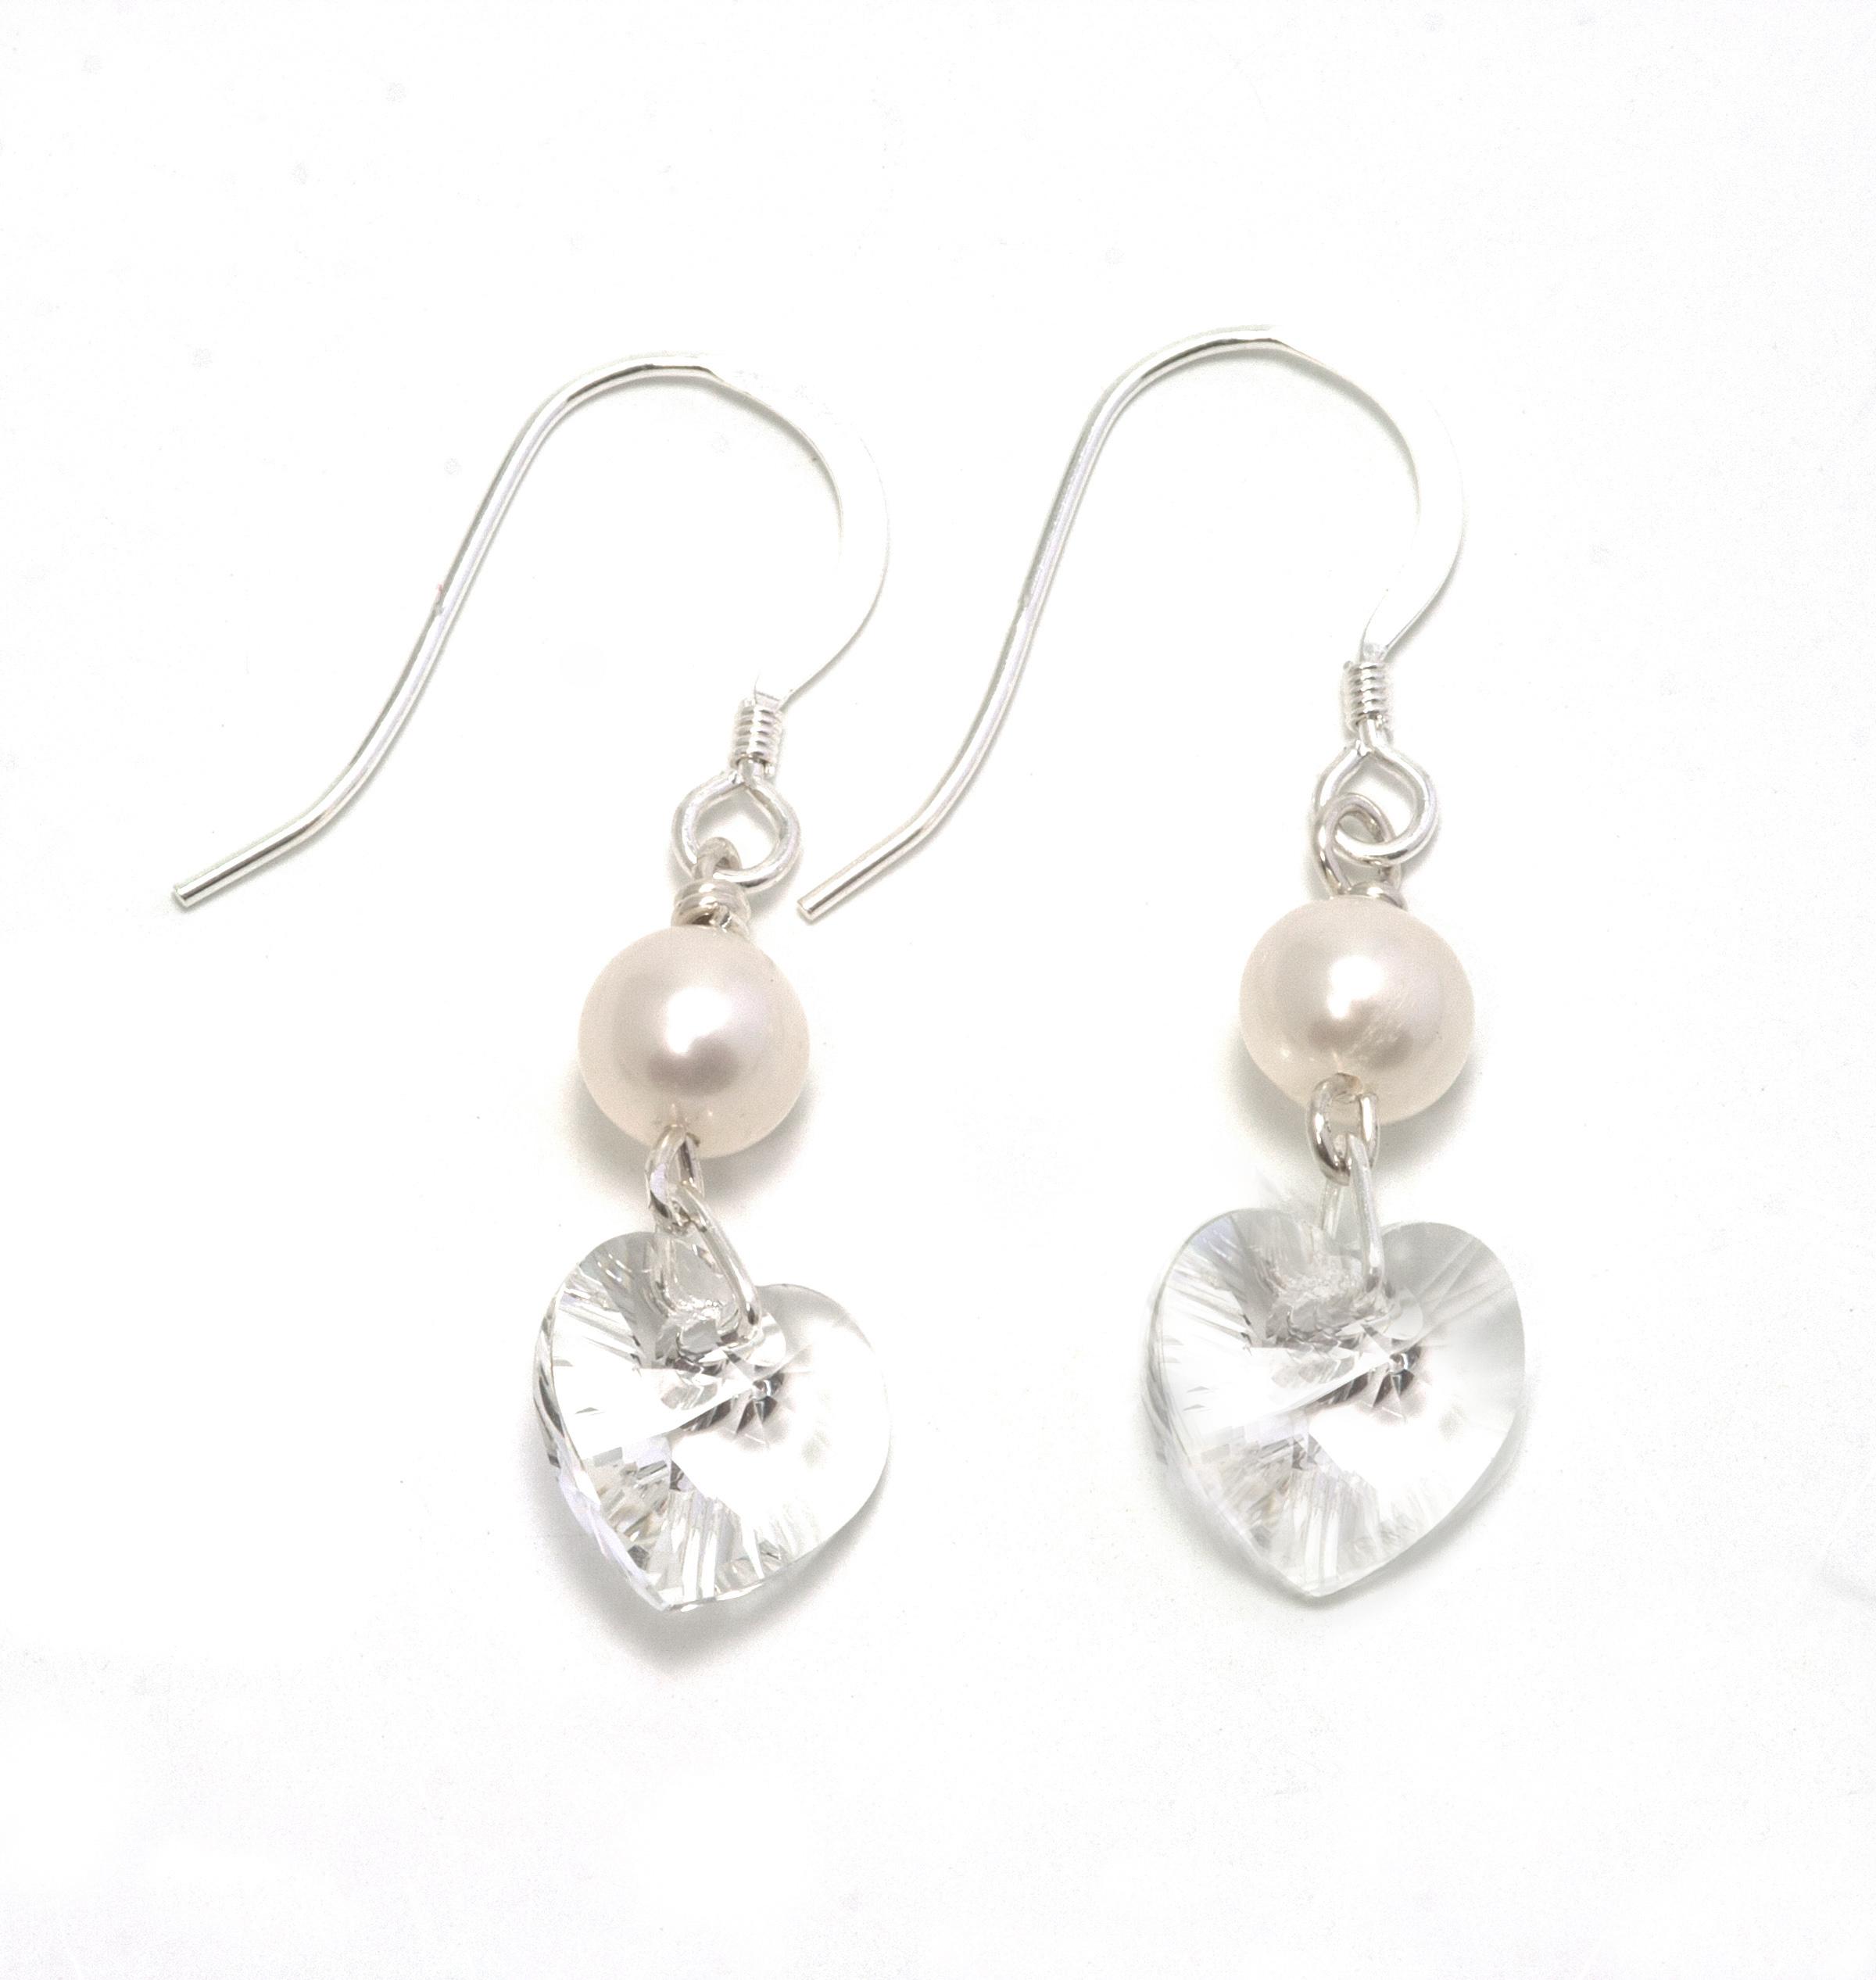 julieannbird.co.uk Moonlight Heart Earrings ú19.50.jpg